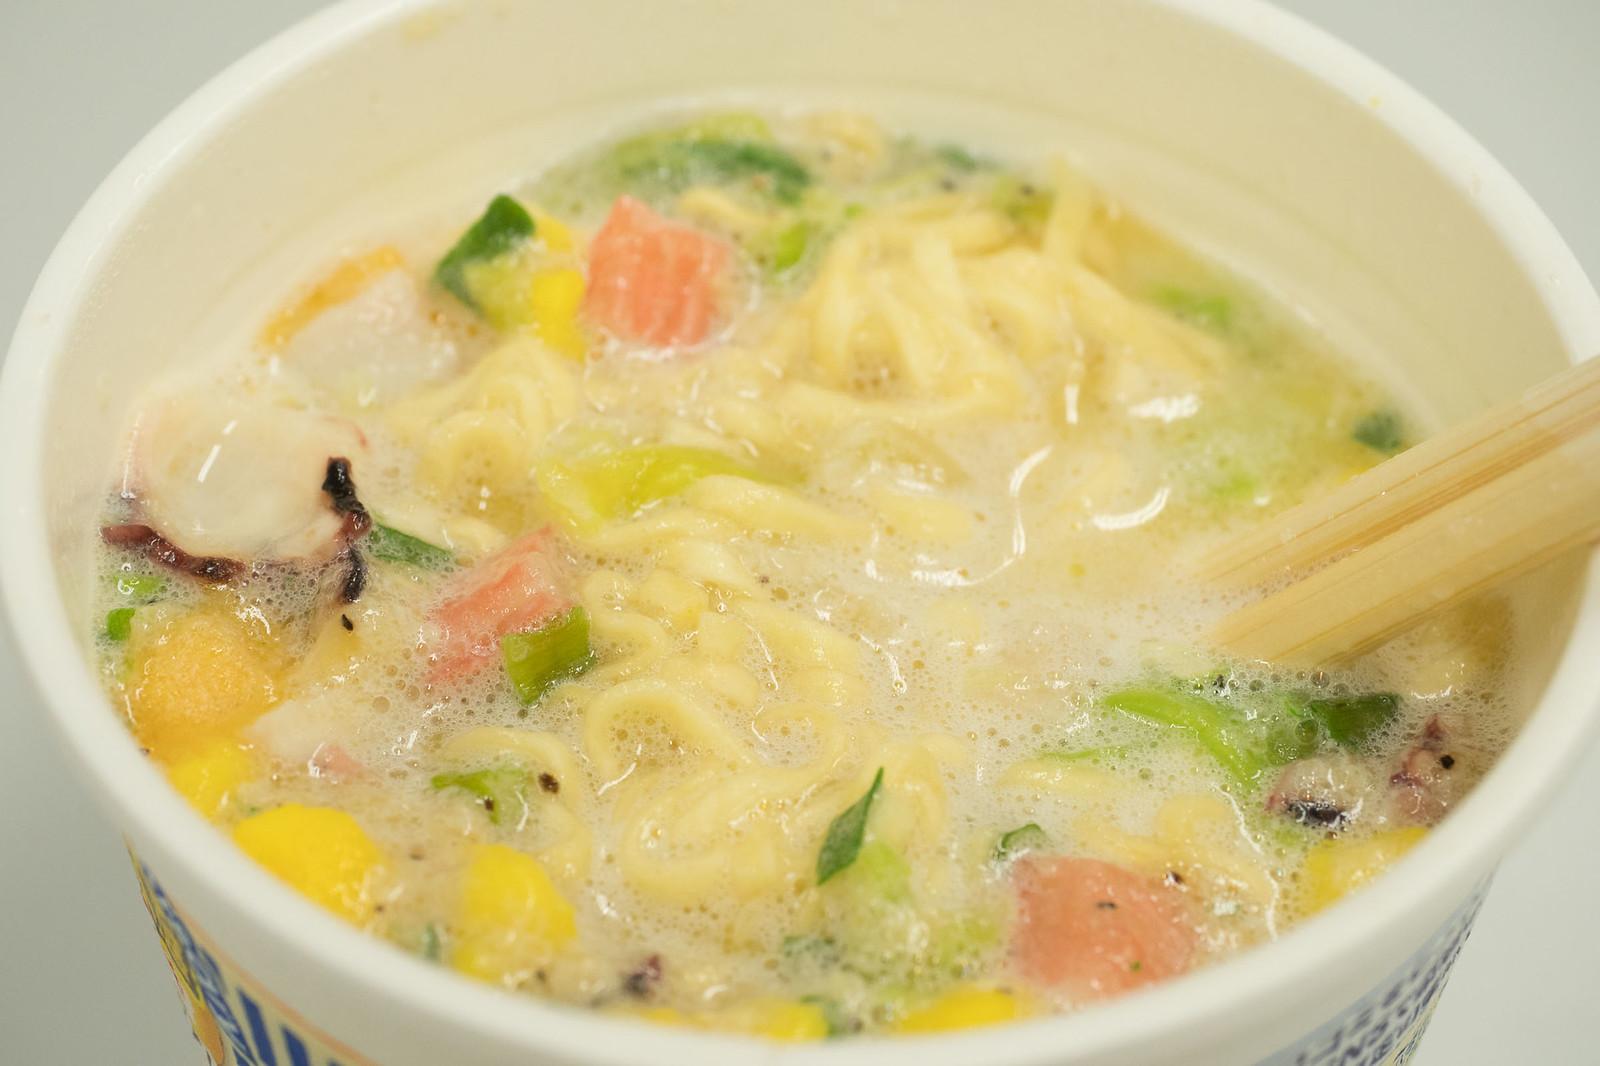 Cupnoodle_Seafood-7